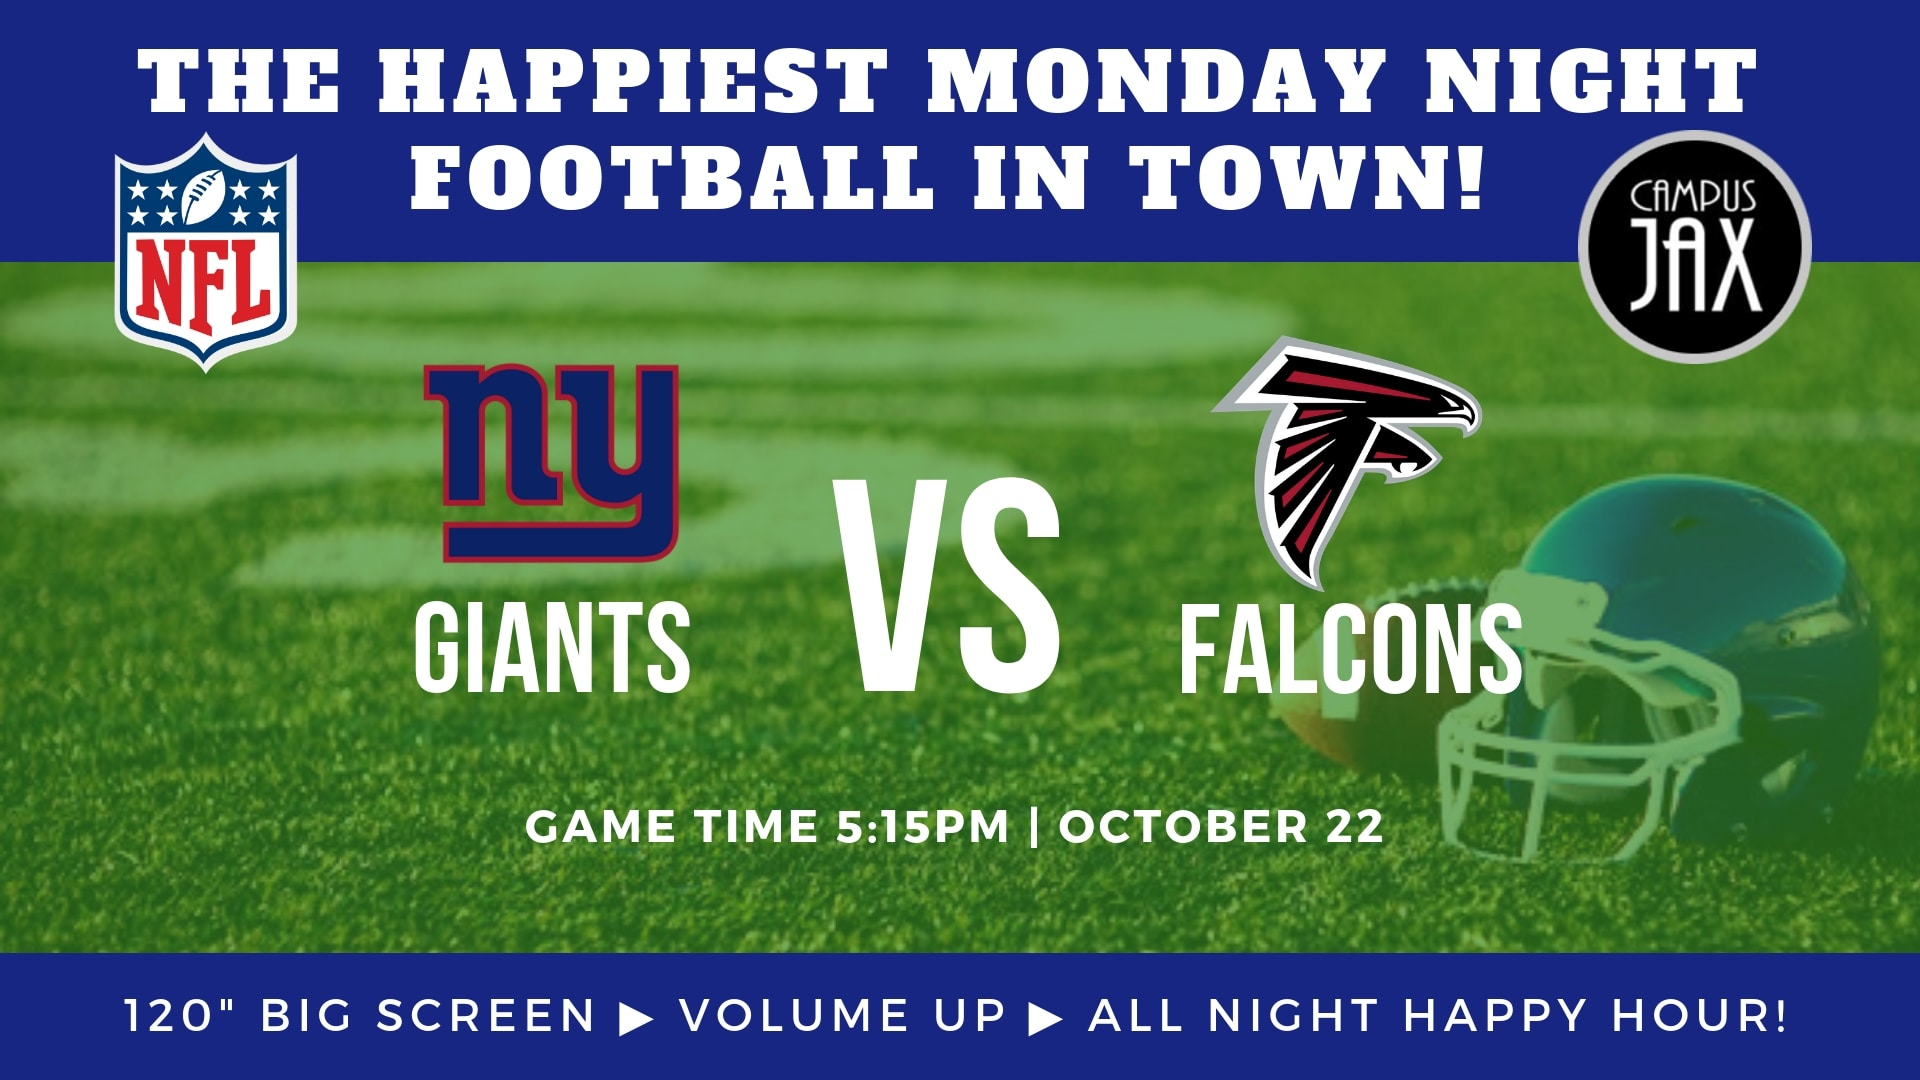 October 22 | MONDAY NIGHT FOOTBALL